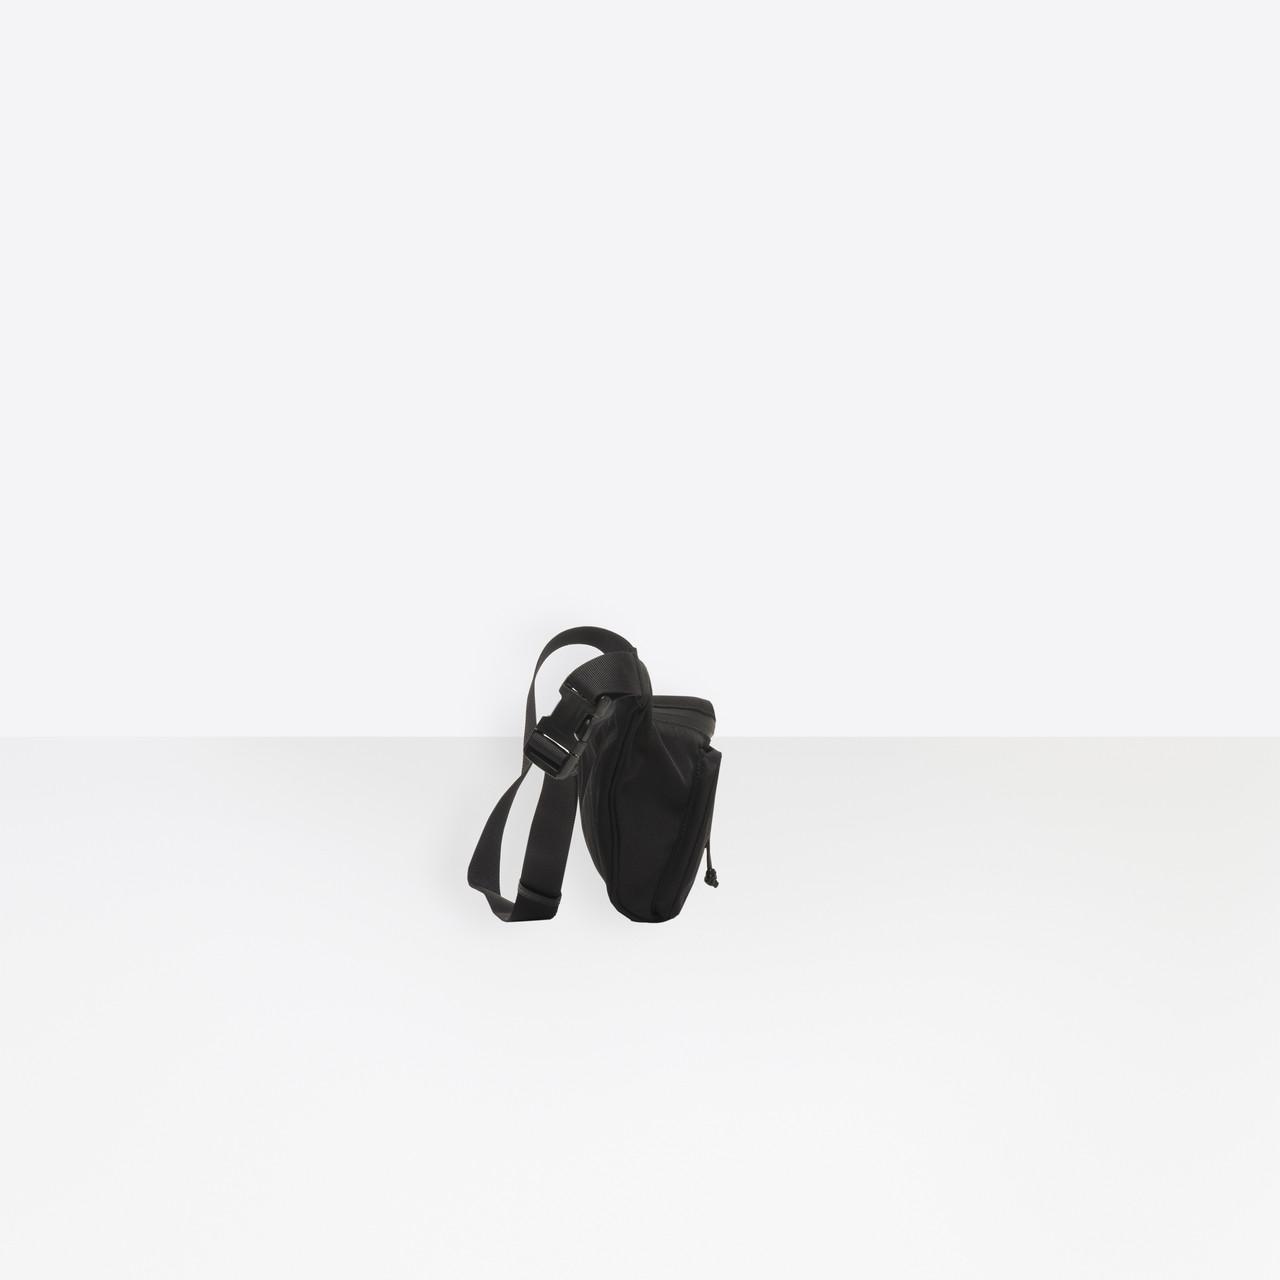 beebeaceee36d6 Balenciaga - Black Explorer Beltpack for Men - Lyst. View fullscreen